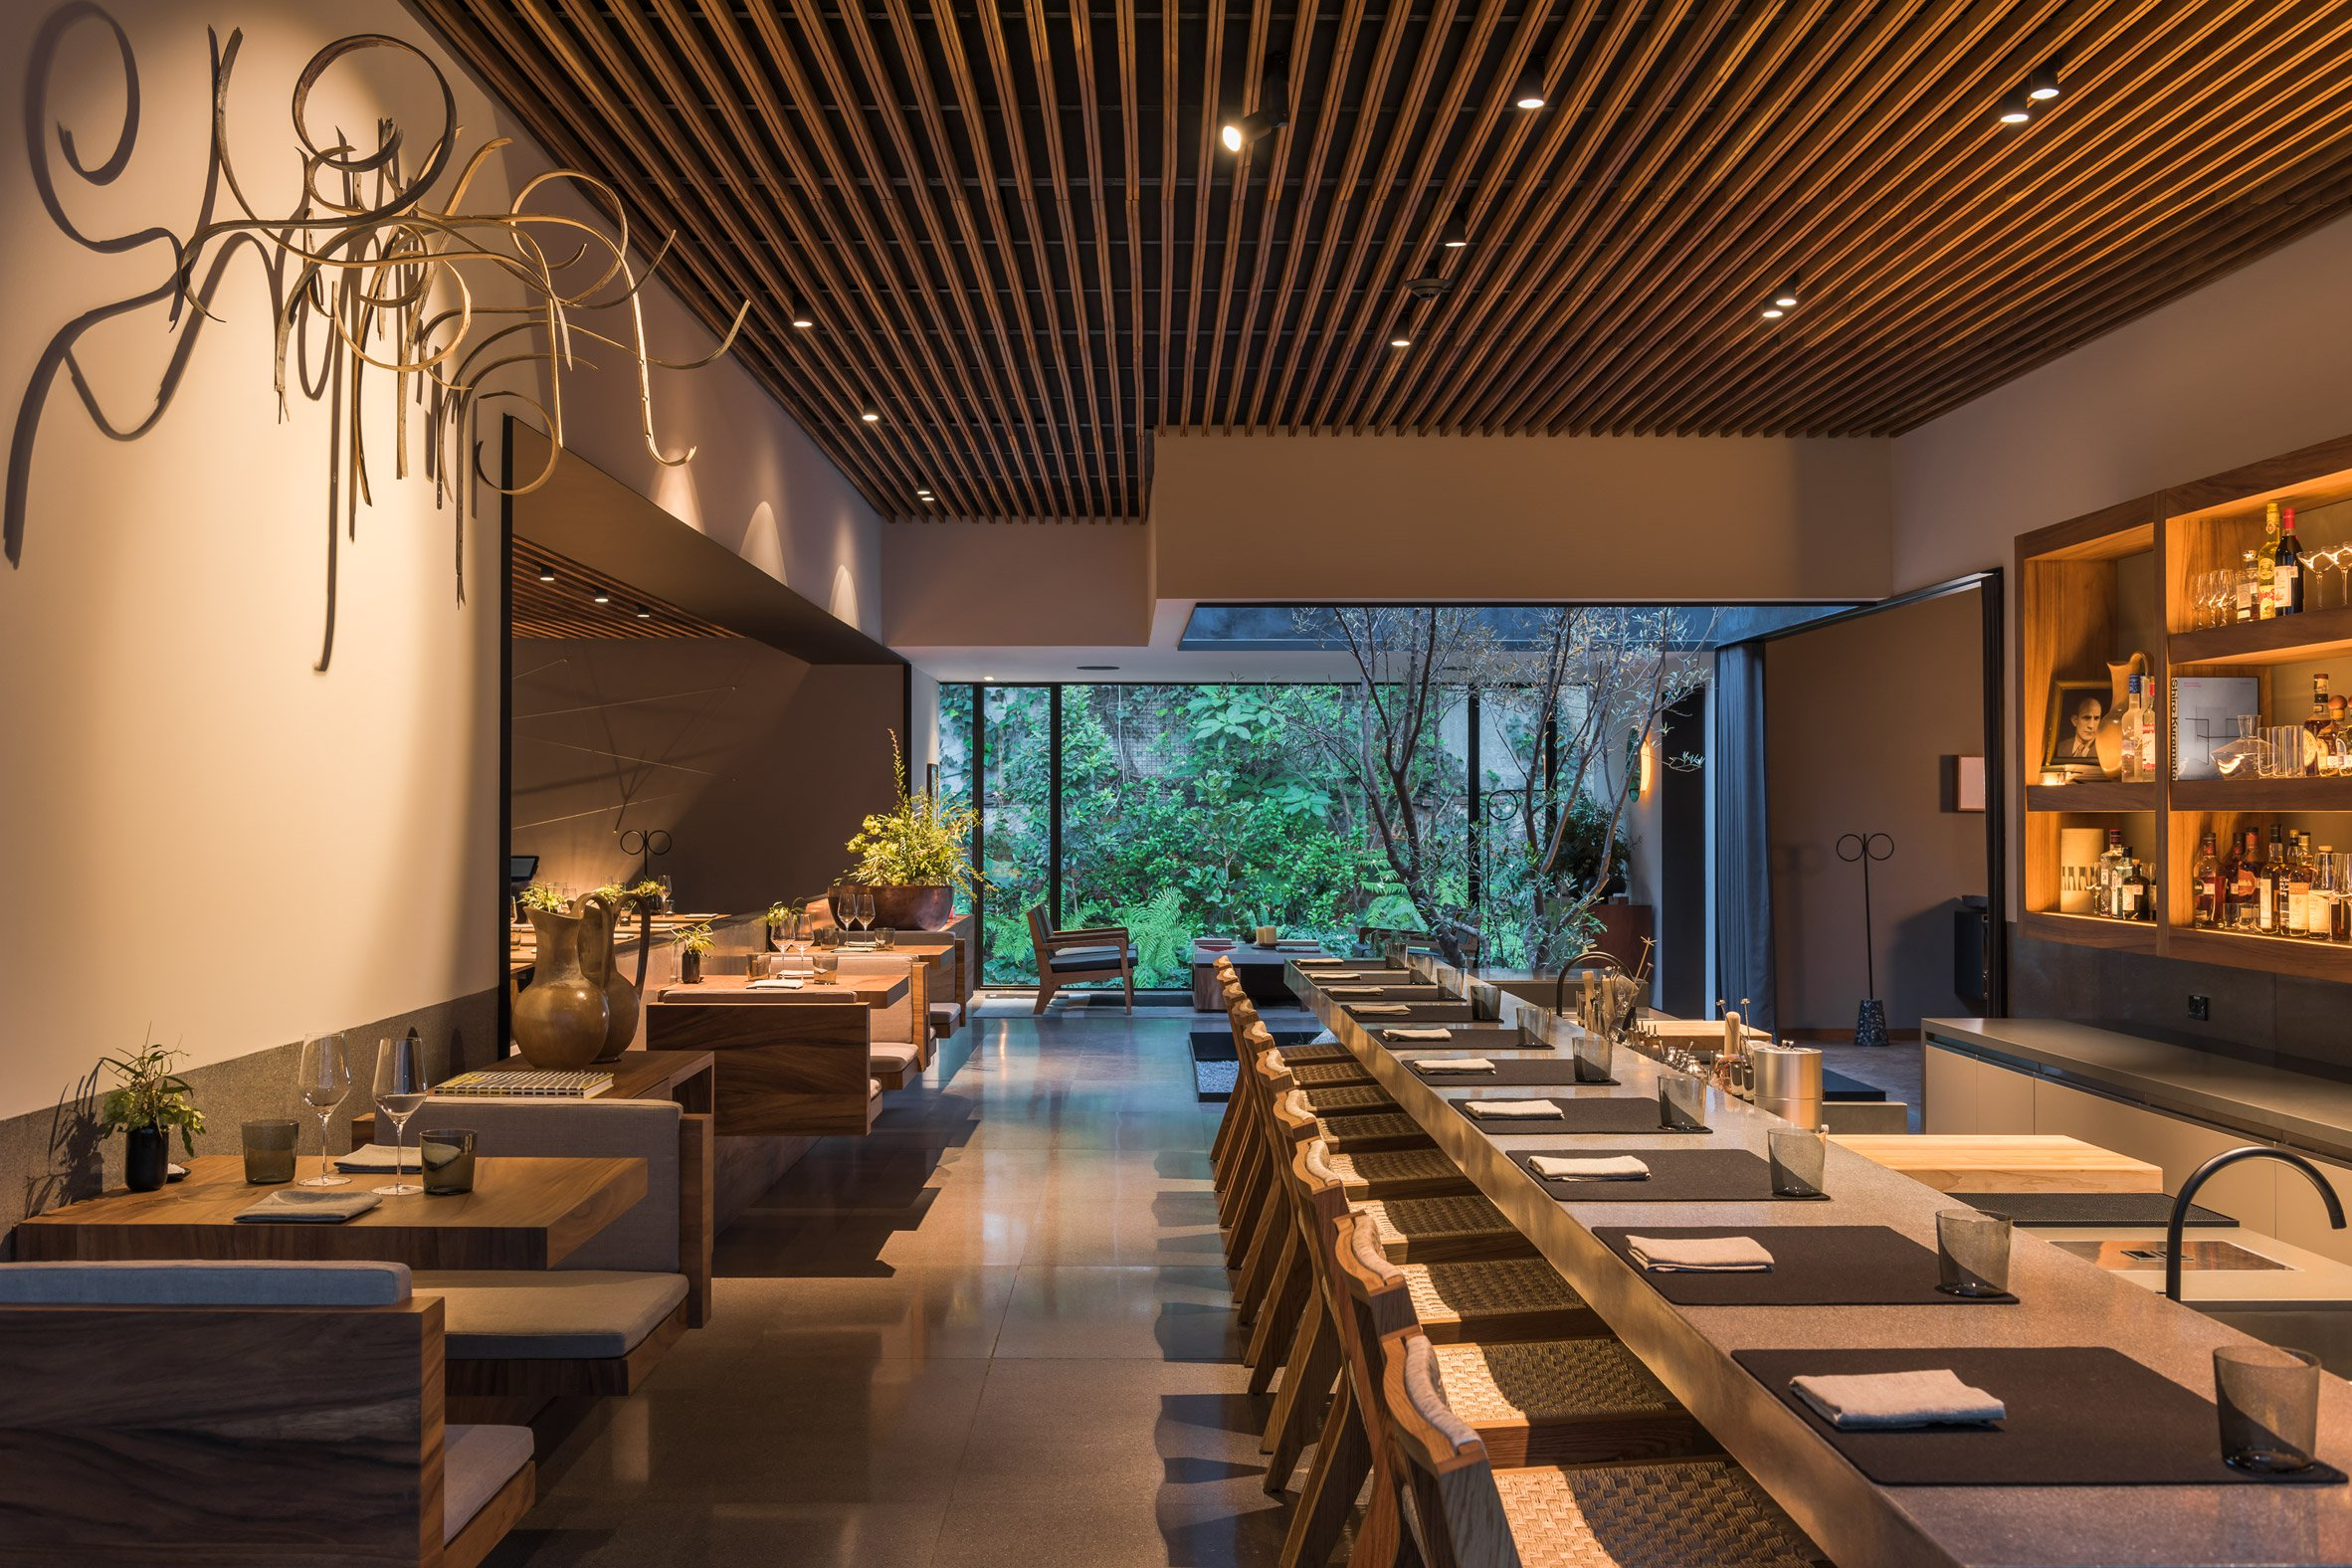 architecture-pujol-restaurant-interiors-design-studia-osnovadesign-osnova-poltava_14